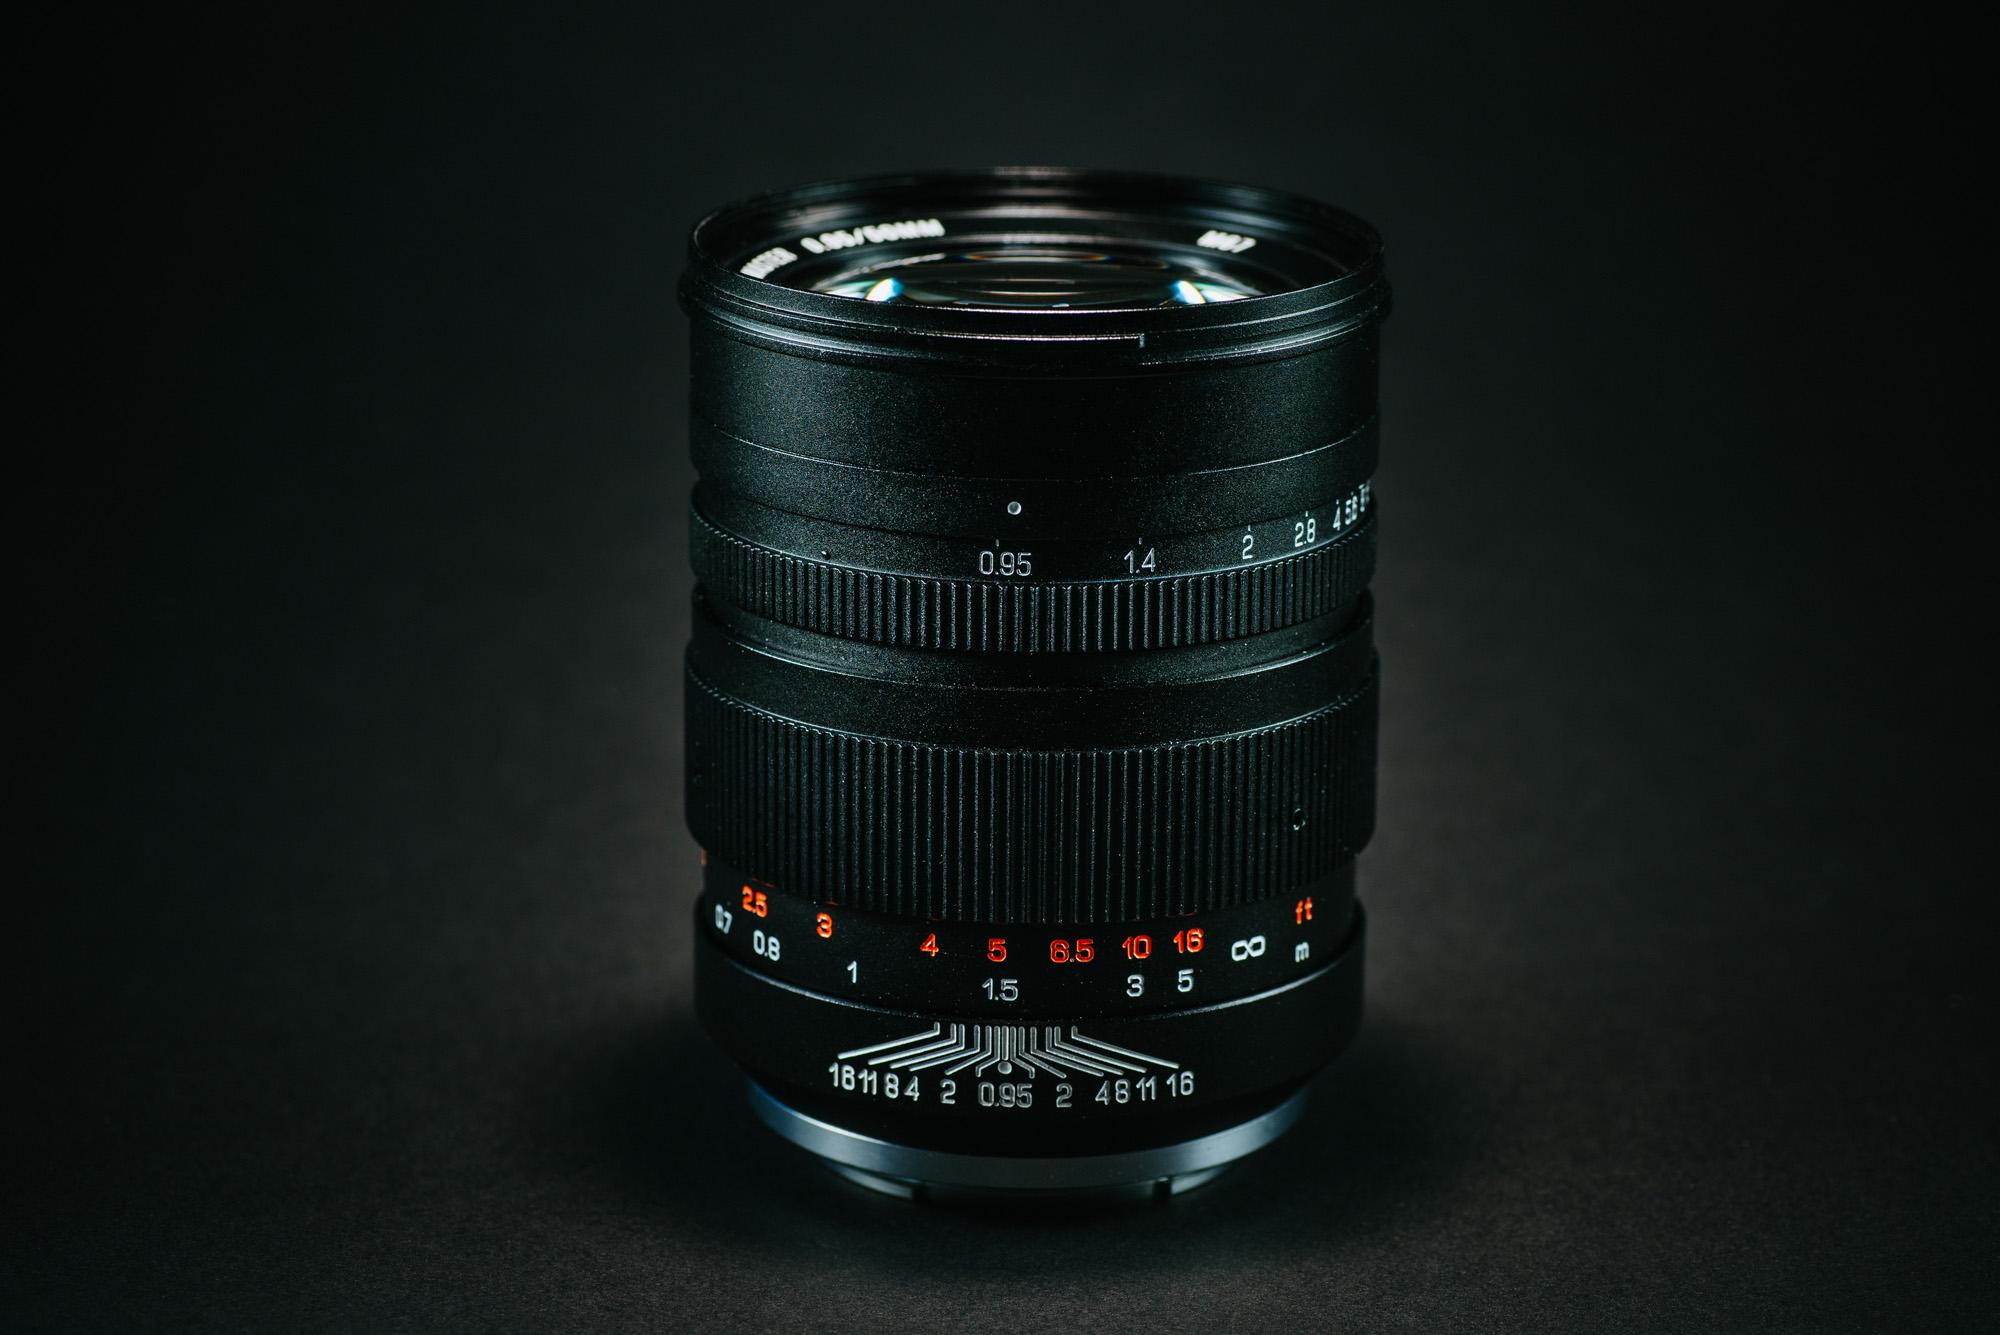 Mitakon-speedmaster-50mm-0.95-review03